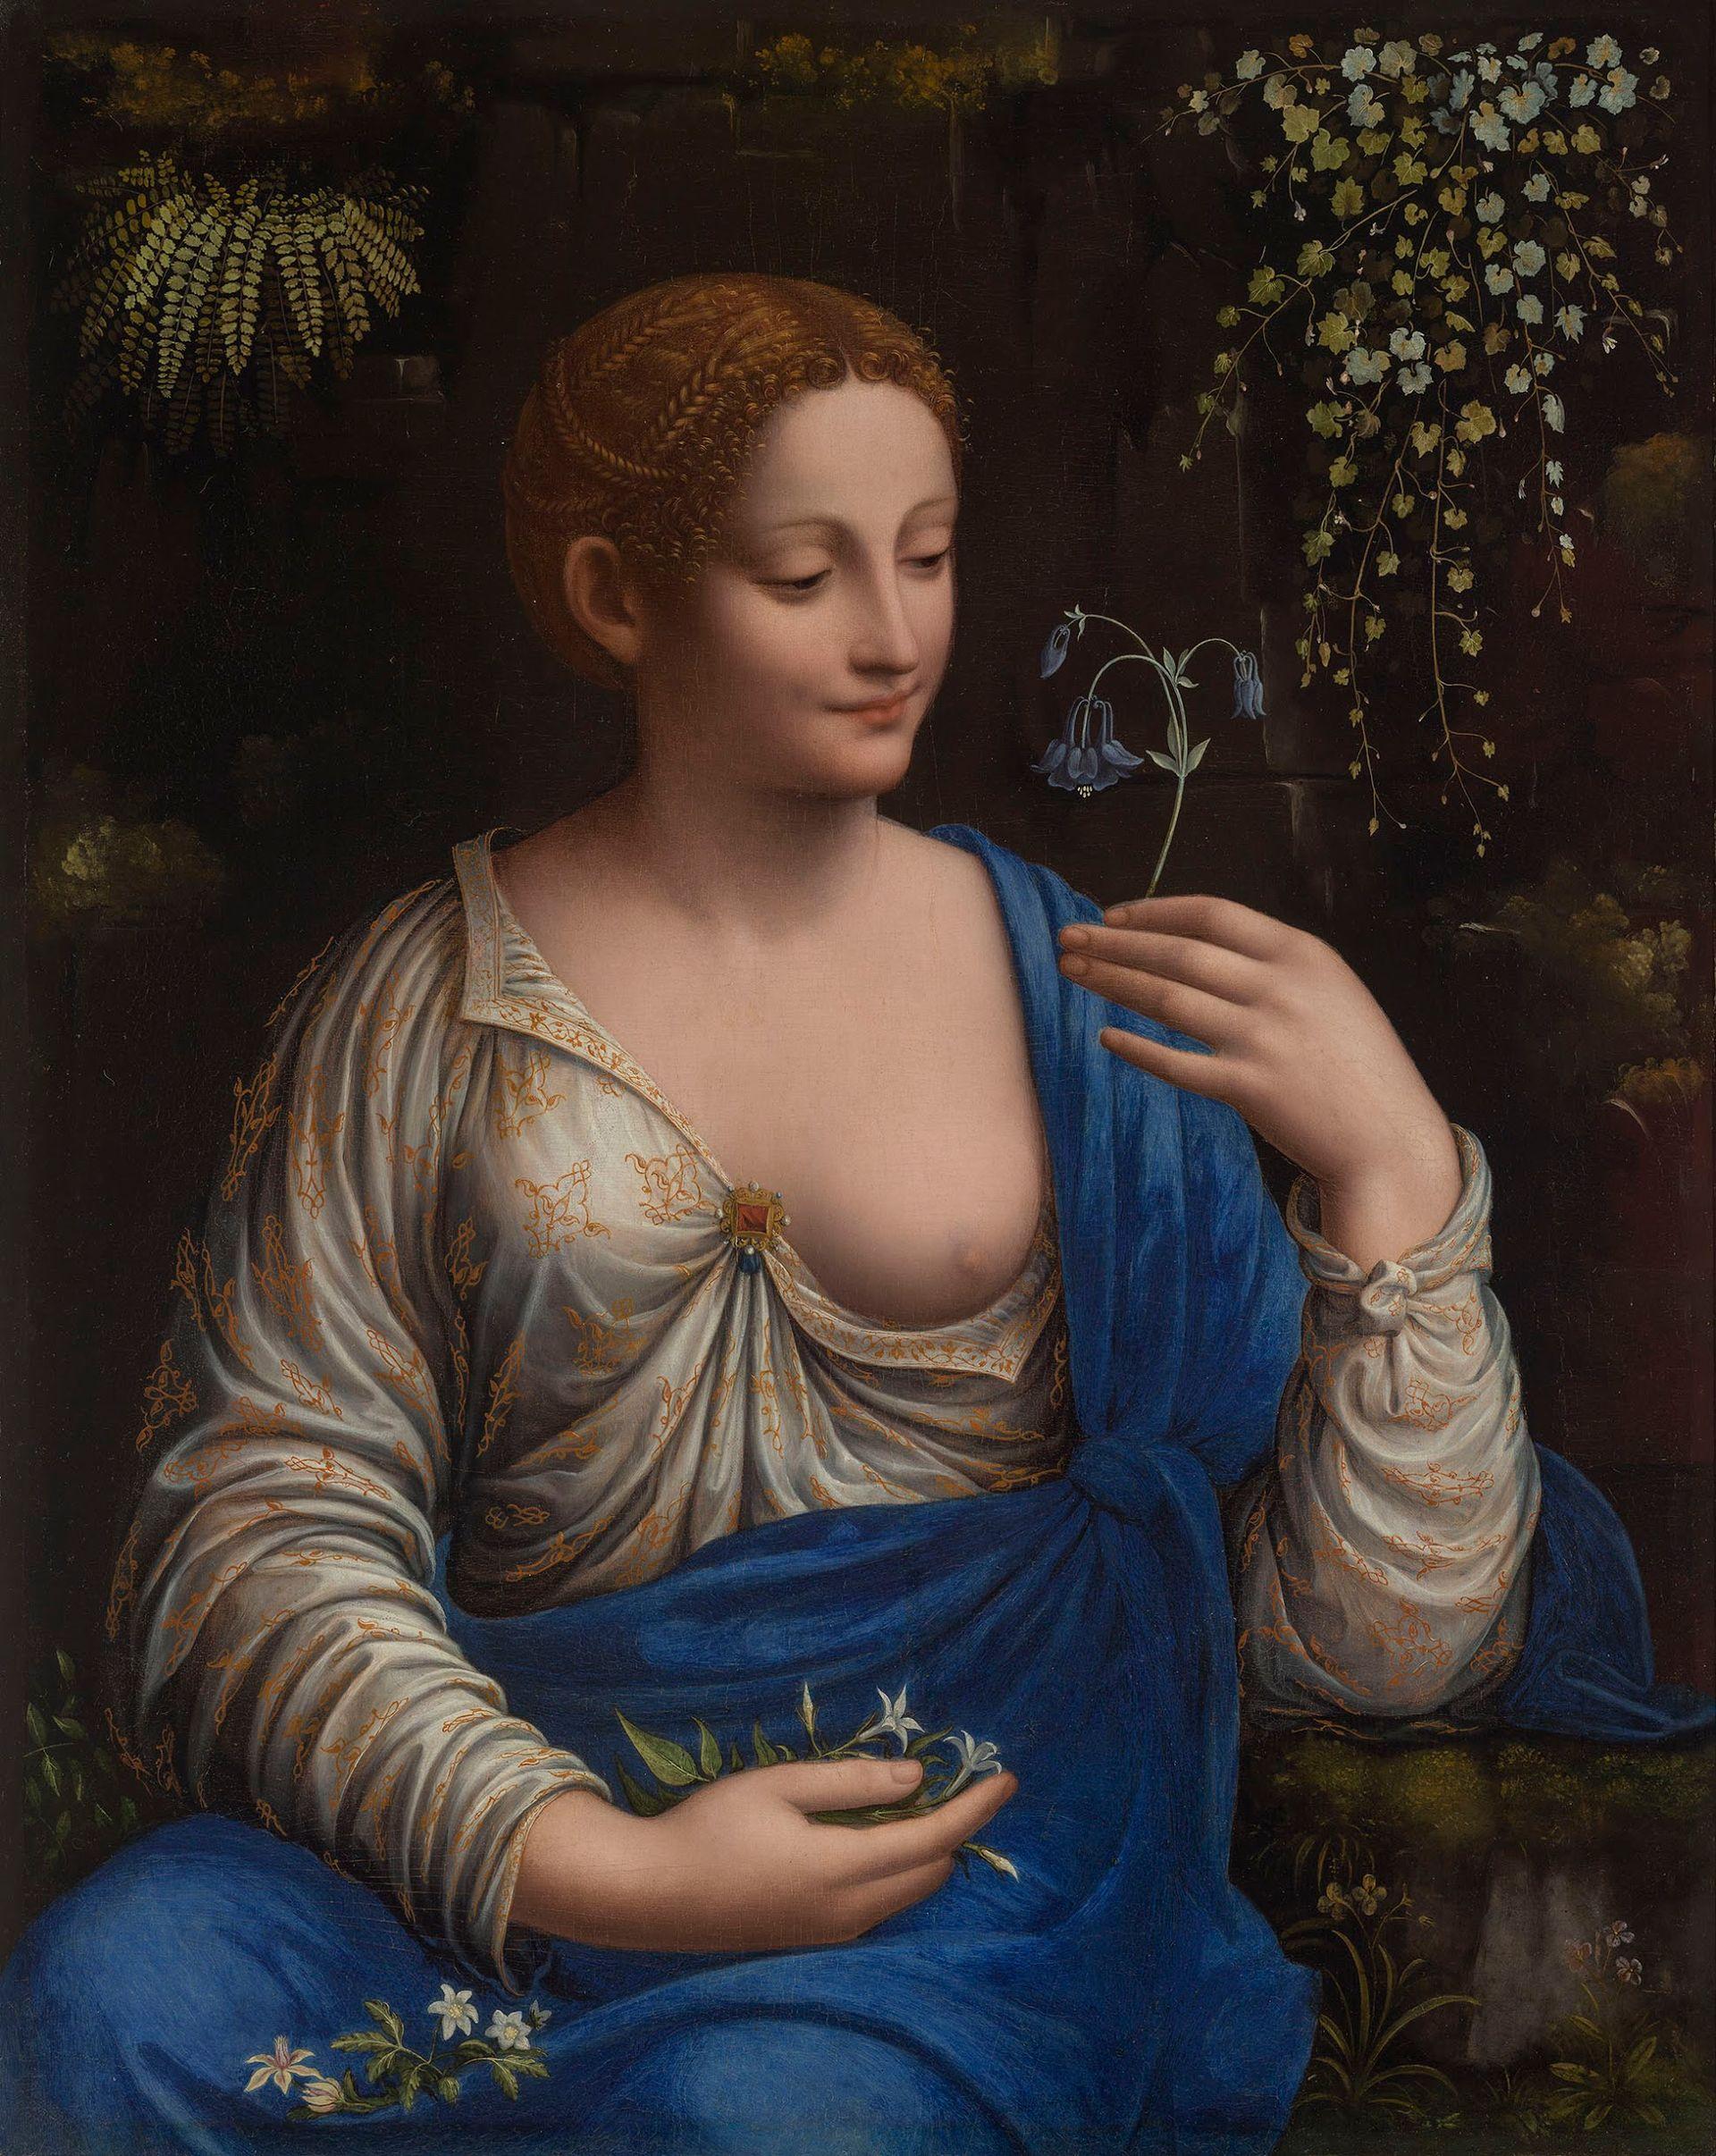 Francesco Melzi, Flora (about 1520) © The State Hermitage Museum, St. Petersburg, 2019. Photo: Vladimir Terebenin